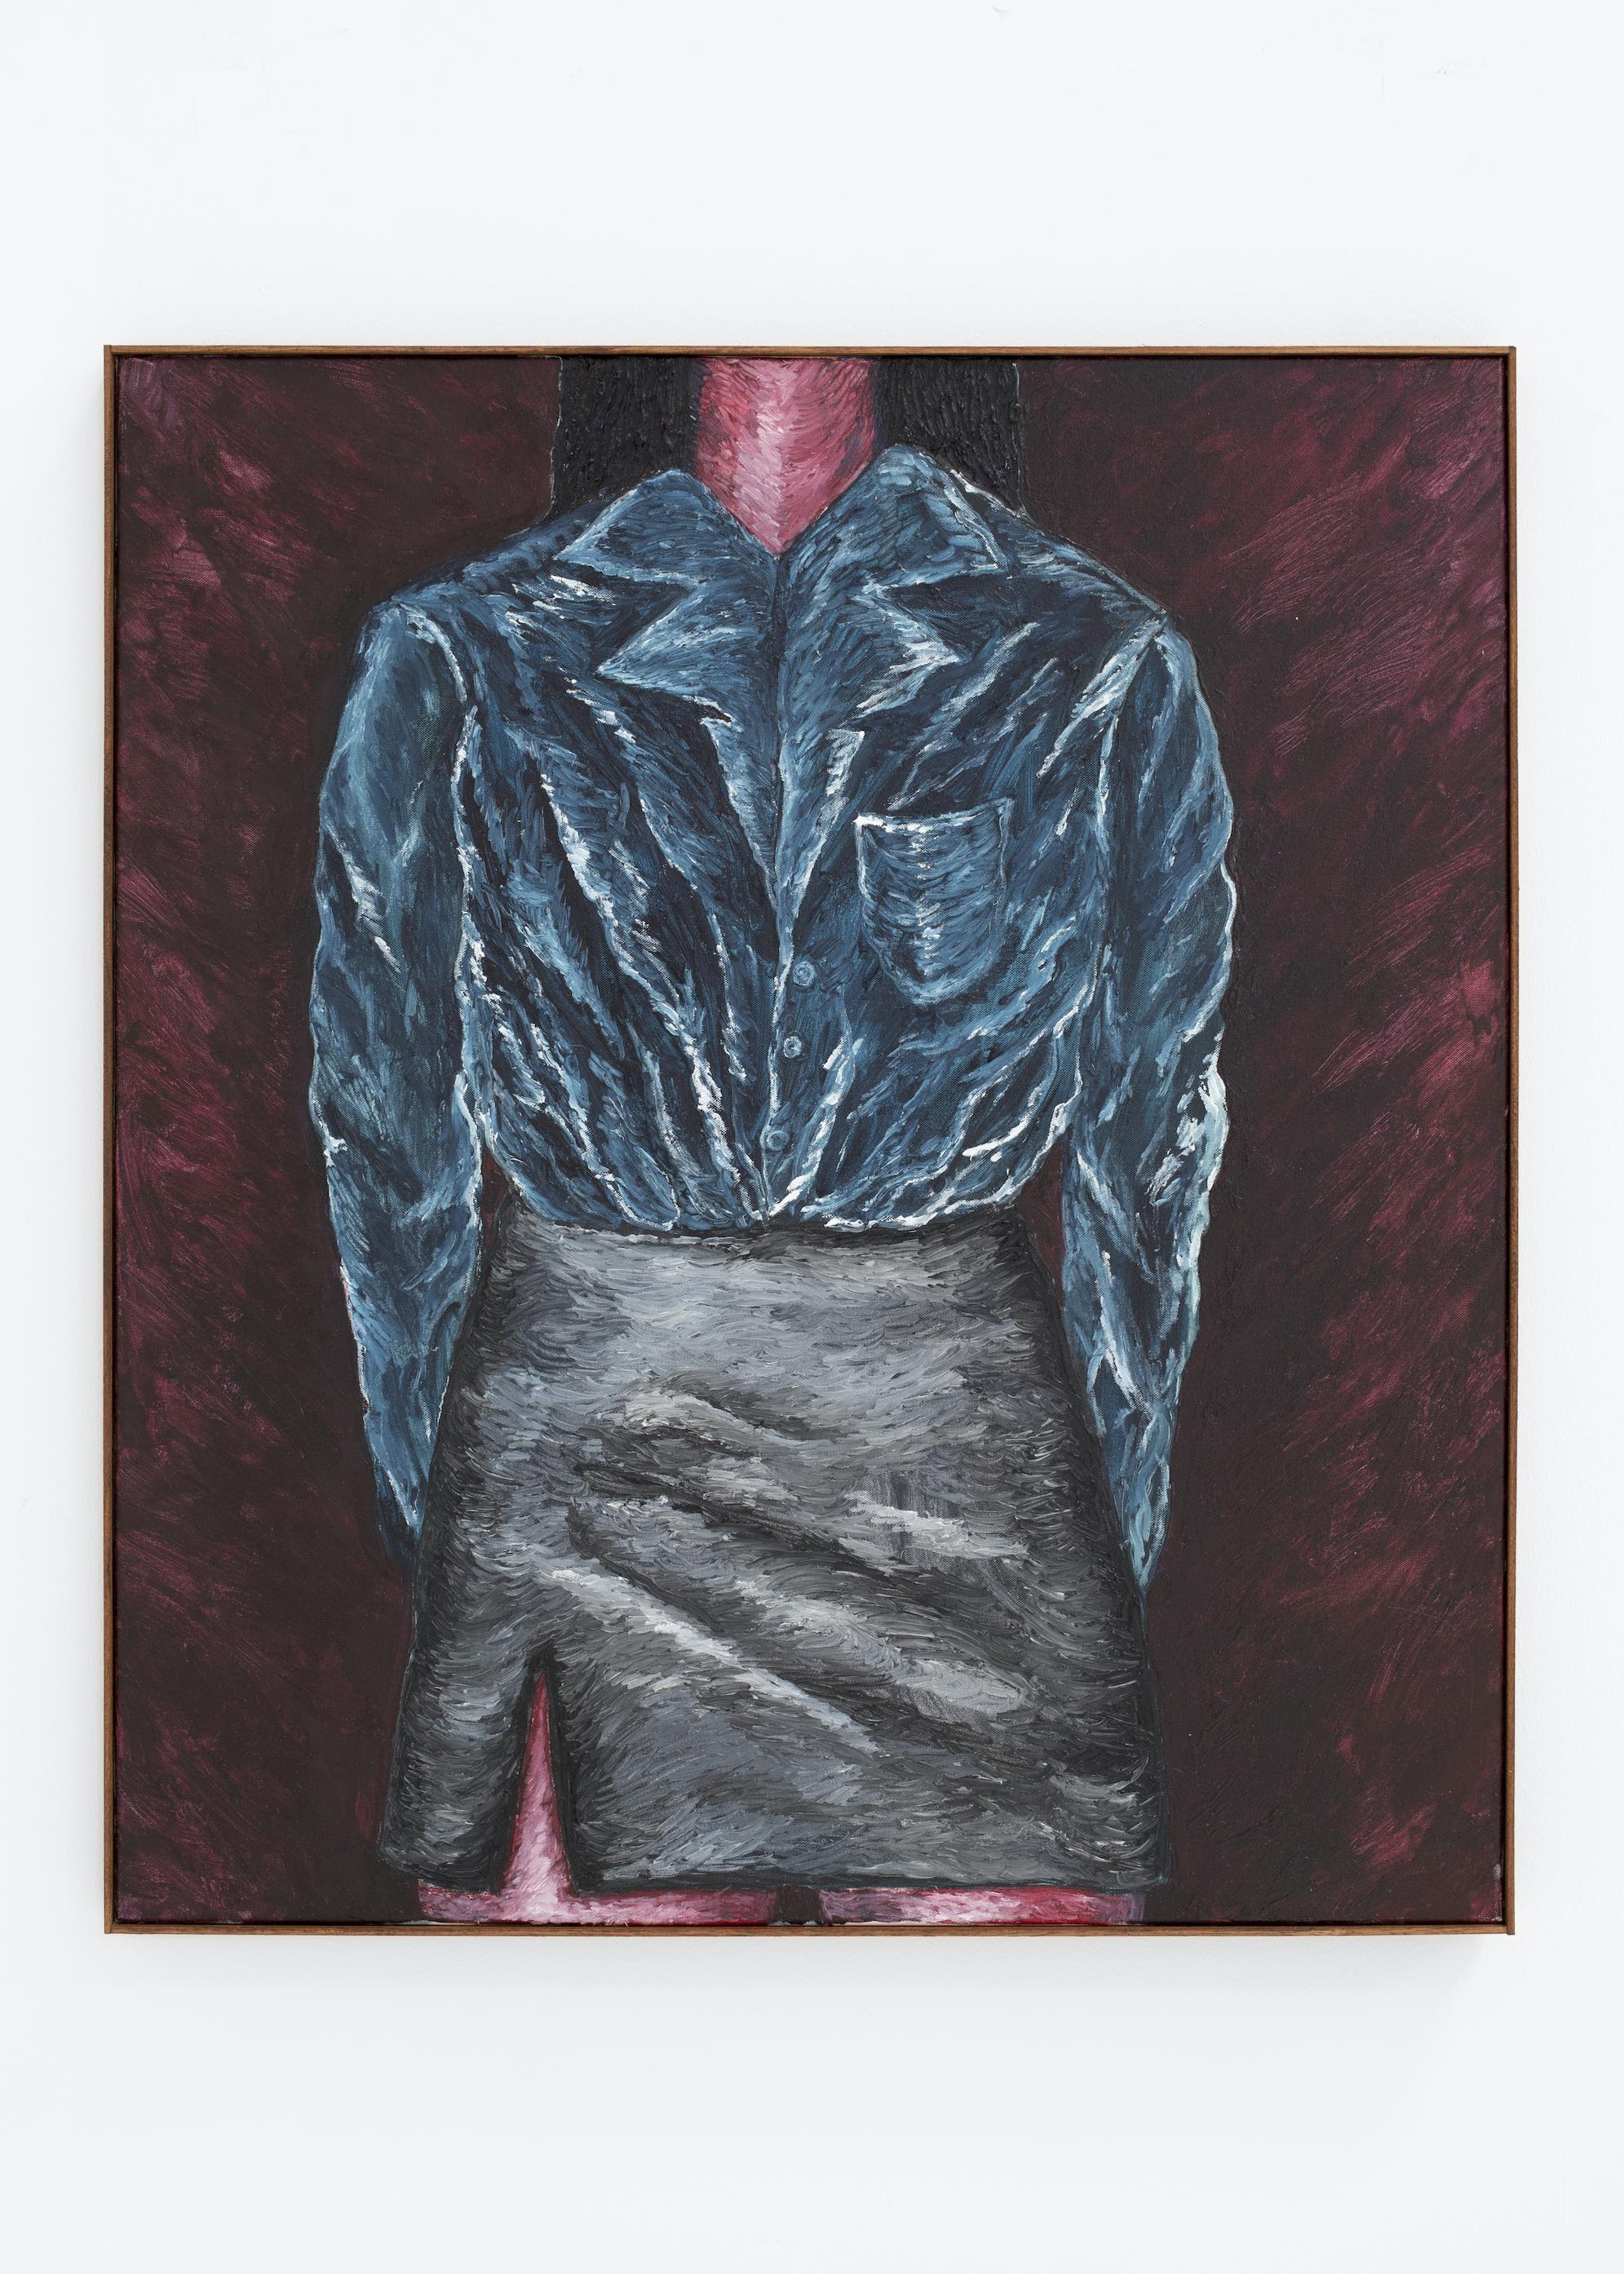 STEVIE DIX Burning ears, 2021 Oil and beeswax on canvas. Óleo y cera sobre lienzo. 90 x 80 cm